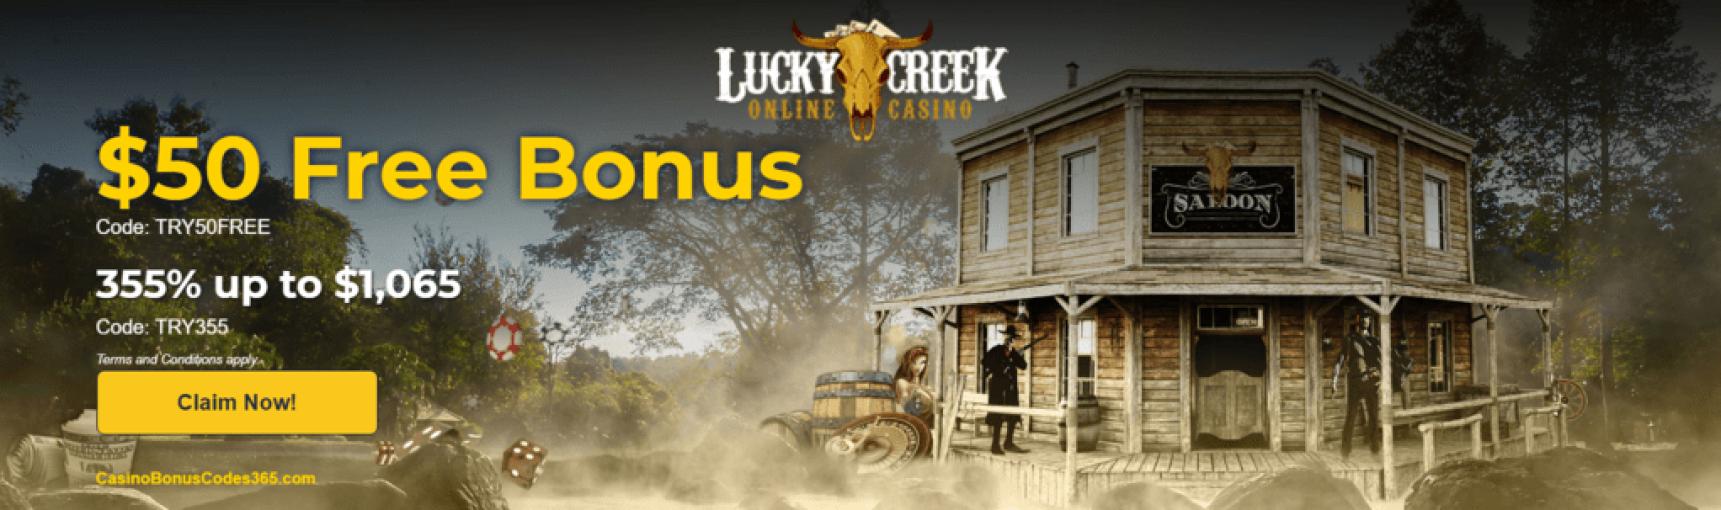 Lucky Creek 50 Free Chip Plus 355 Match Bonus Casino Bonus